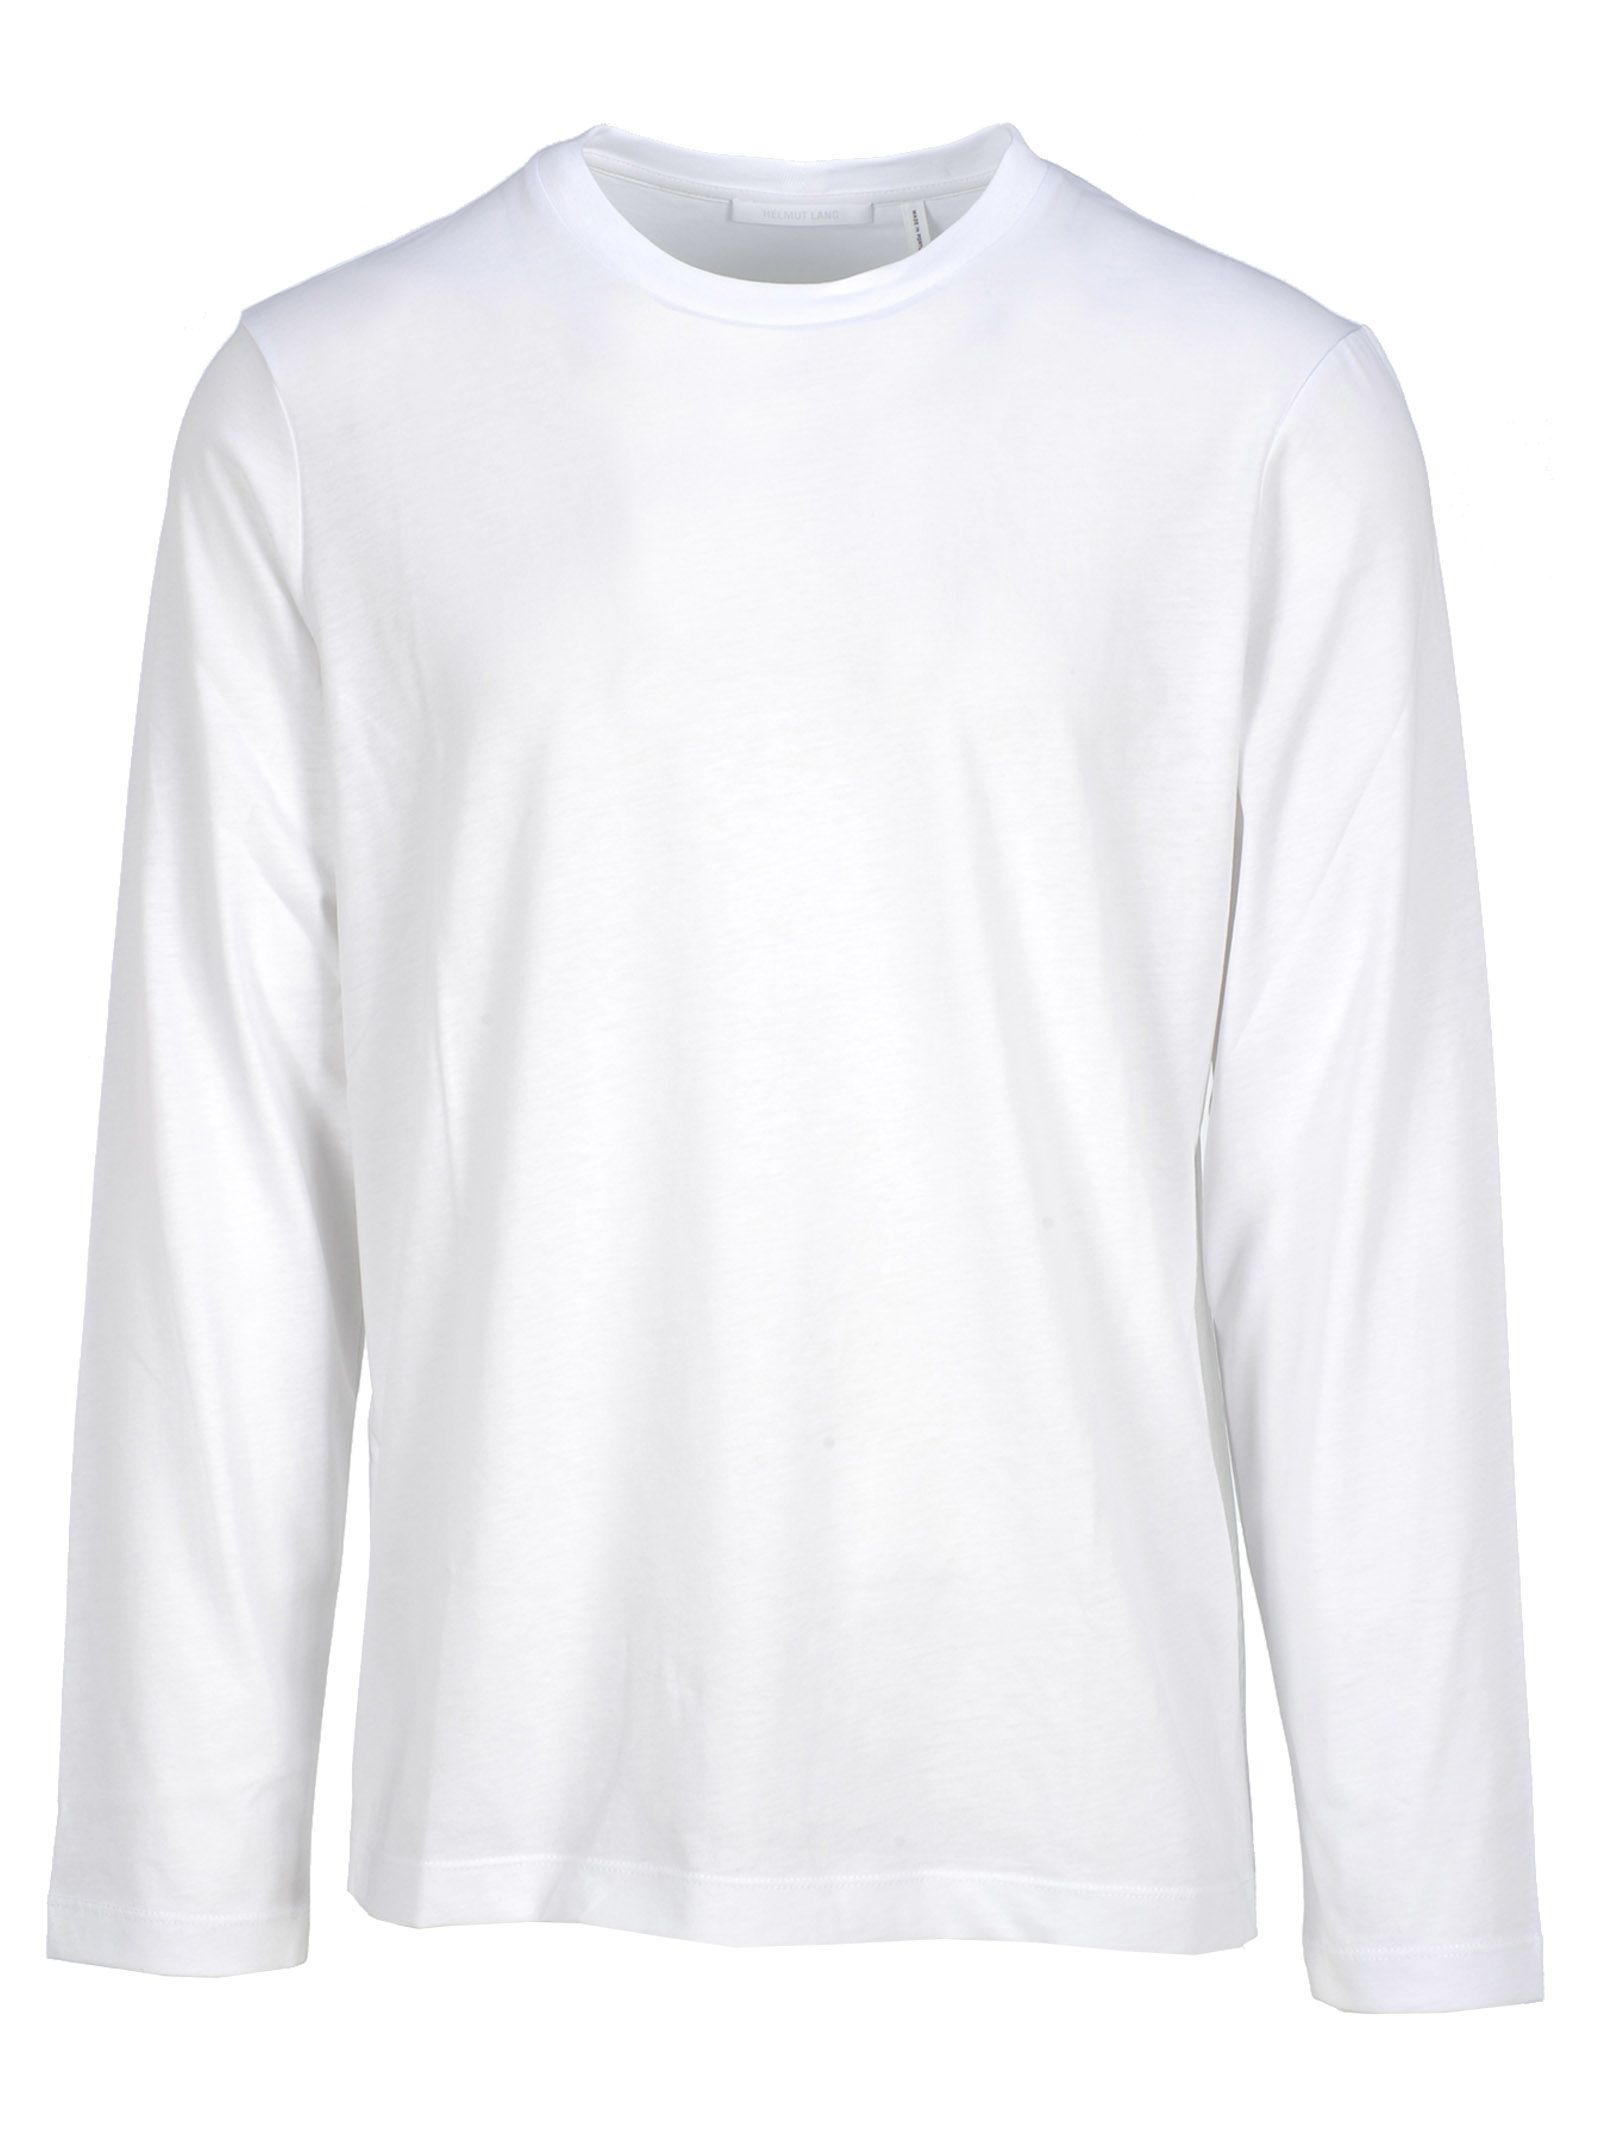 77d6c4a2 Helmut Lang Helmut Lang Helmut Lang Logo Print Long-sleeve T-shirt ...